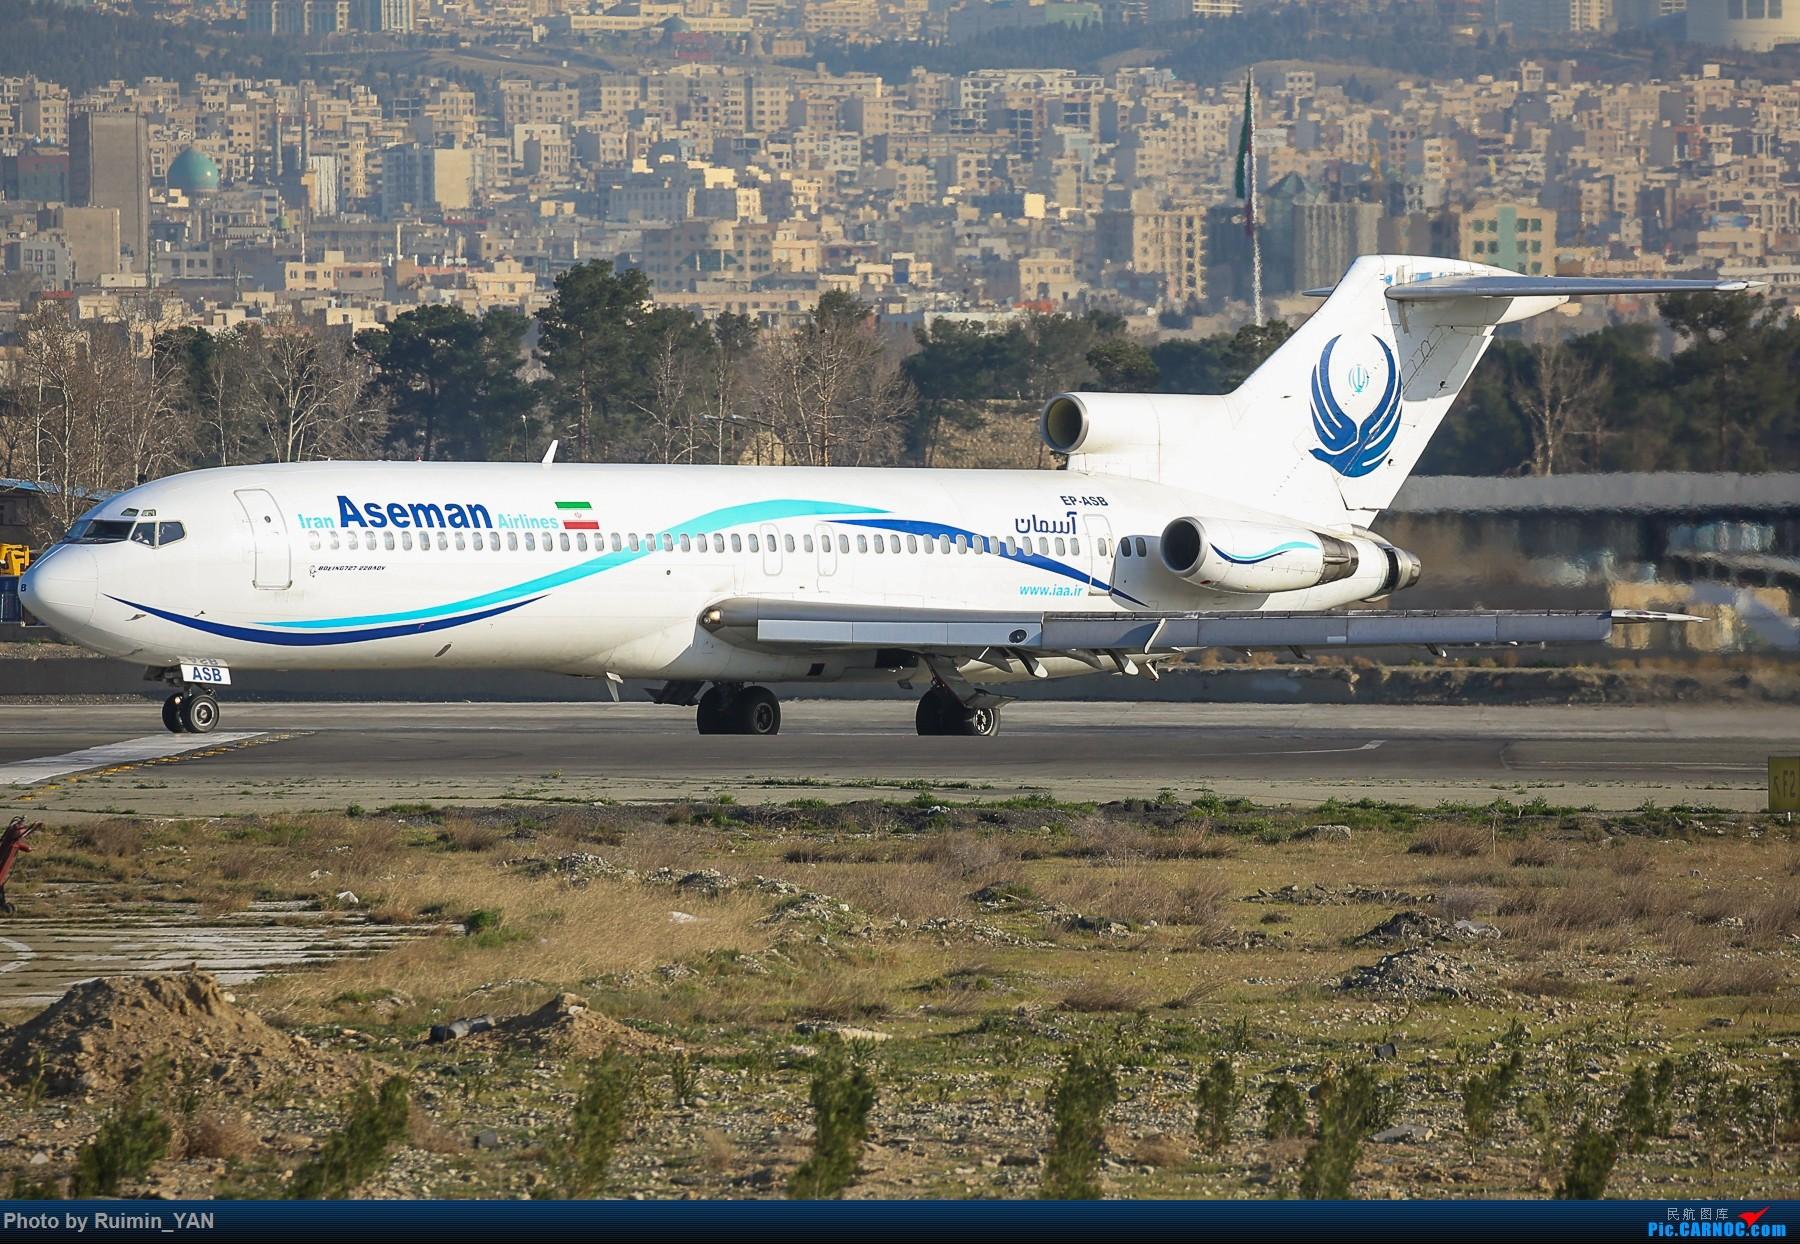 Re:[原创]【THR】【一图党】【波音727】德黑兰梅赫拉巴德机场--伊朗阿斯曼航空(Iran Aseman Airlines,EP)--波音727-200 BOEING 727-200 EP-ASB 德黑兰梅赫拉巴德国际机场